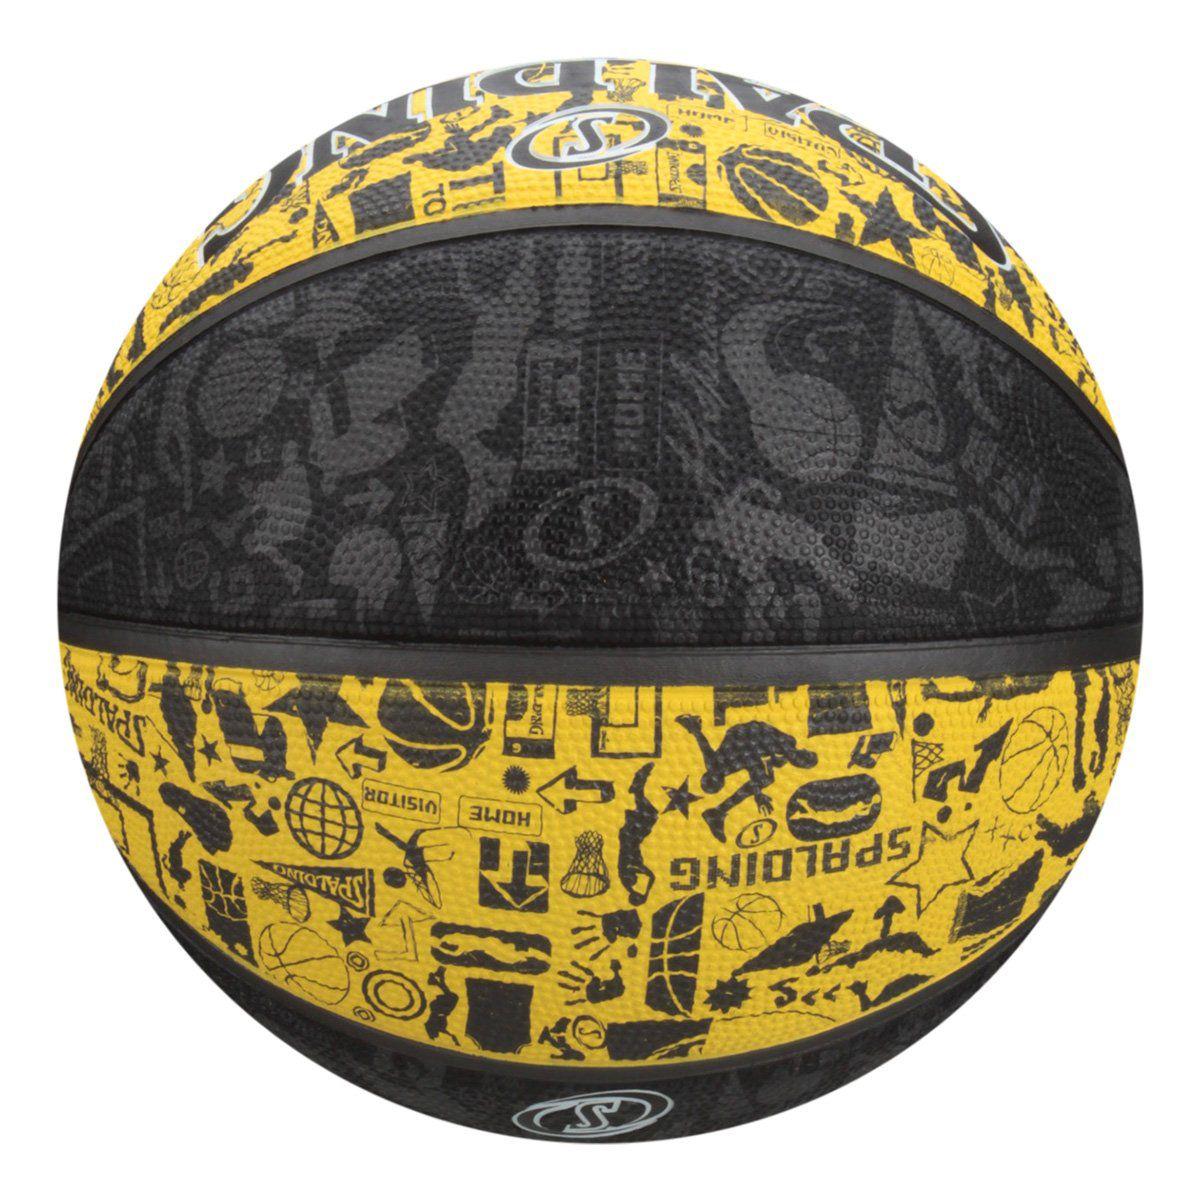 BOLA BASQUETE NBA SPALDING GRAFFITI TAM. 7 - AMARELO E CINZA